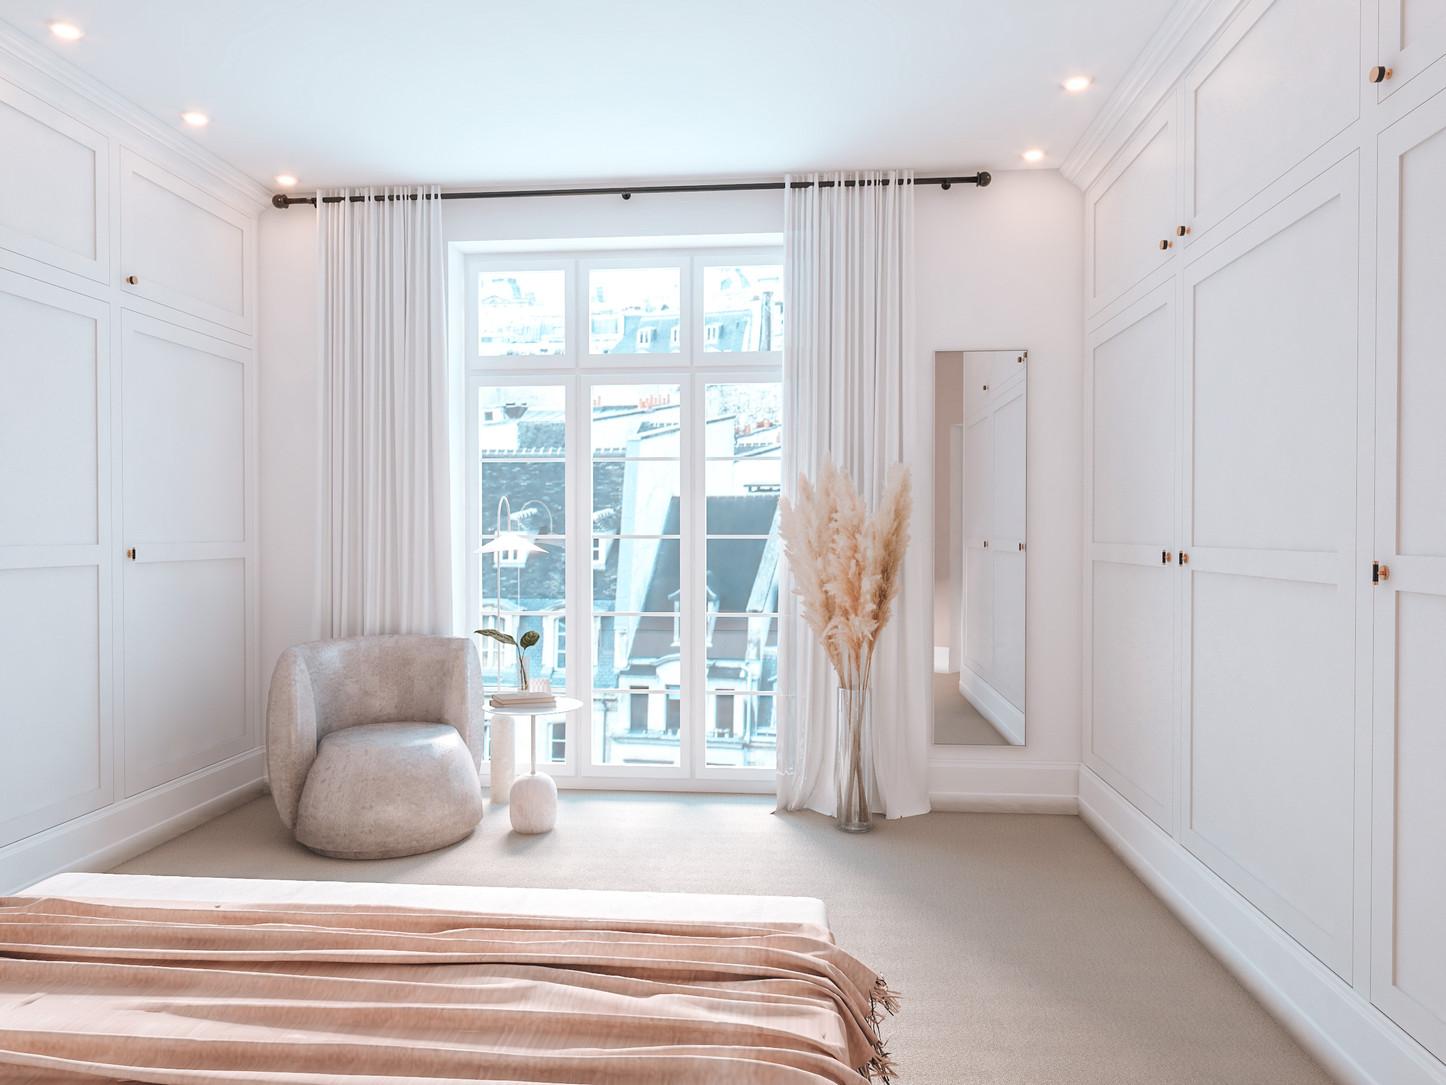 Interior_design_master_bedroom_5_contemp